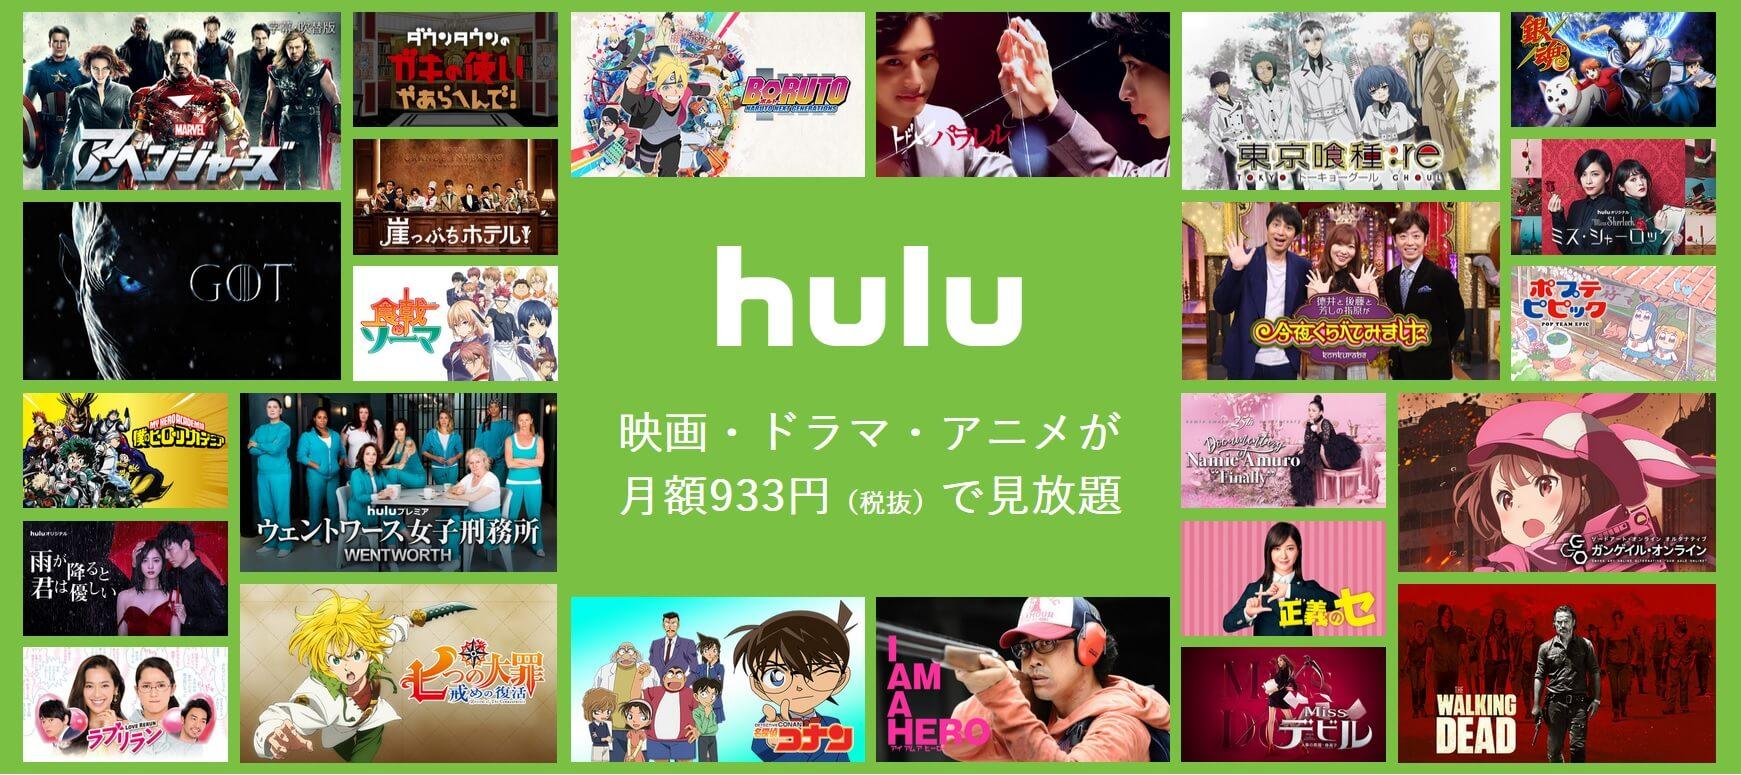 Huluの2週間無料トライアルの詳細と登録・解約方法まとめ!無料期間中の退会もOK!